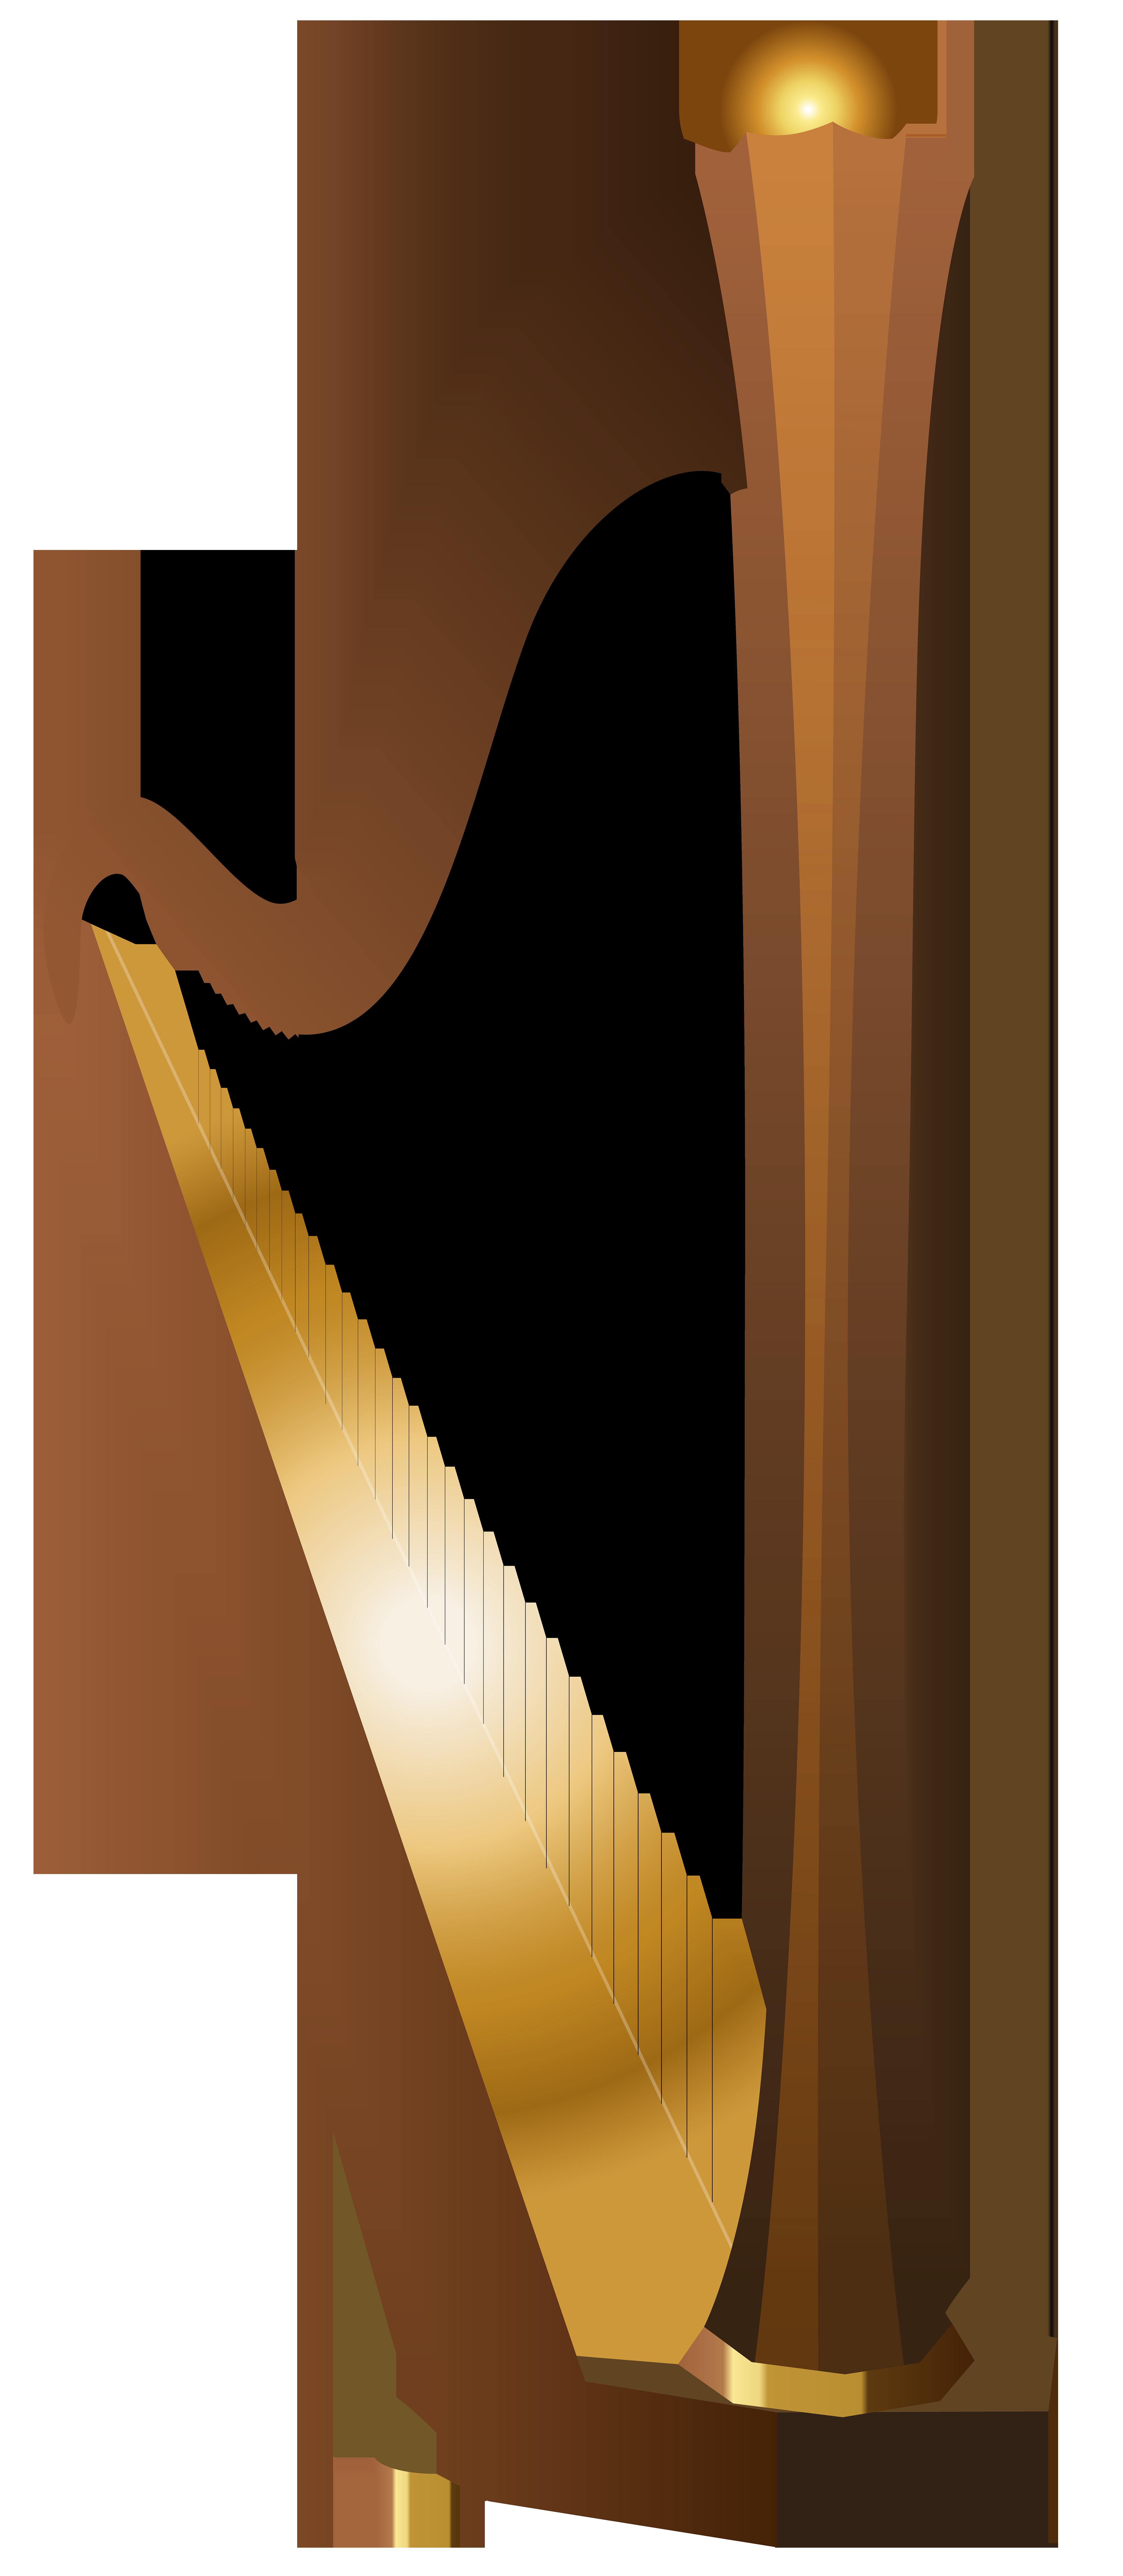 Clipart Harp, Harp Free Clipart.